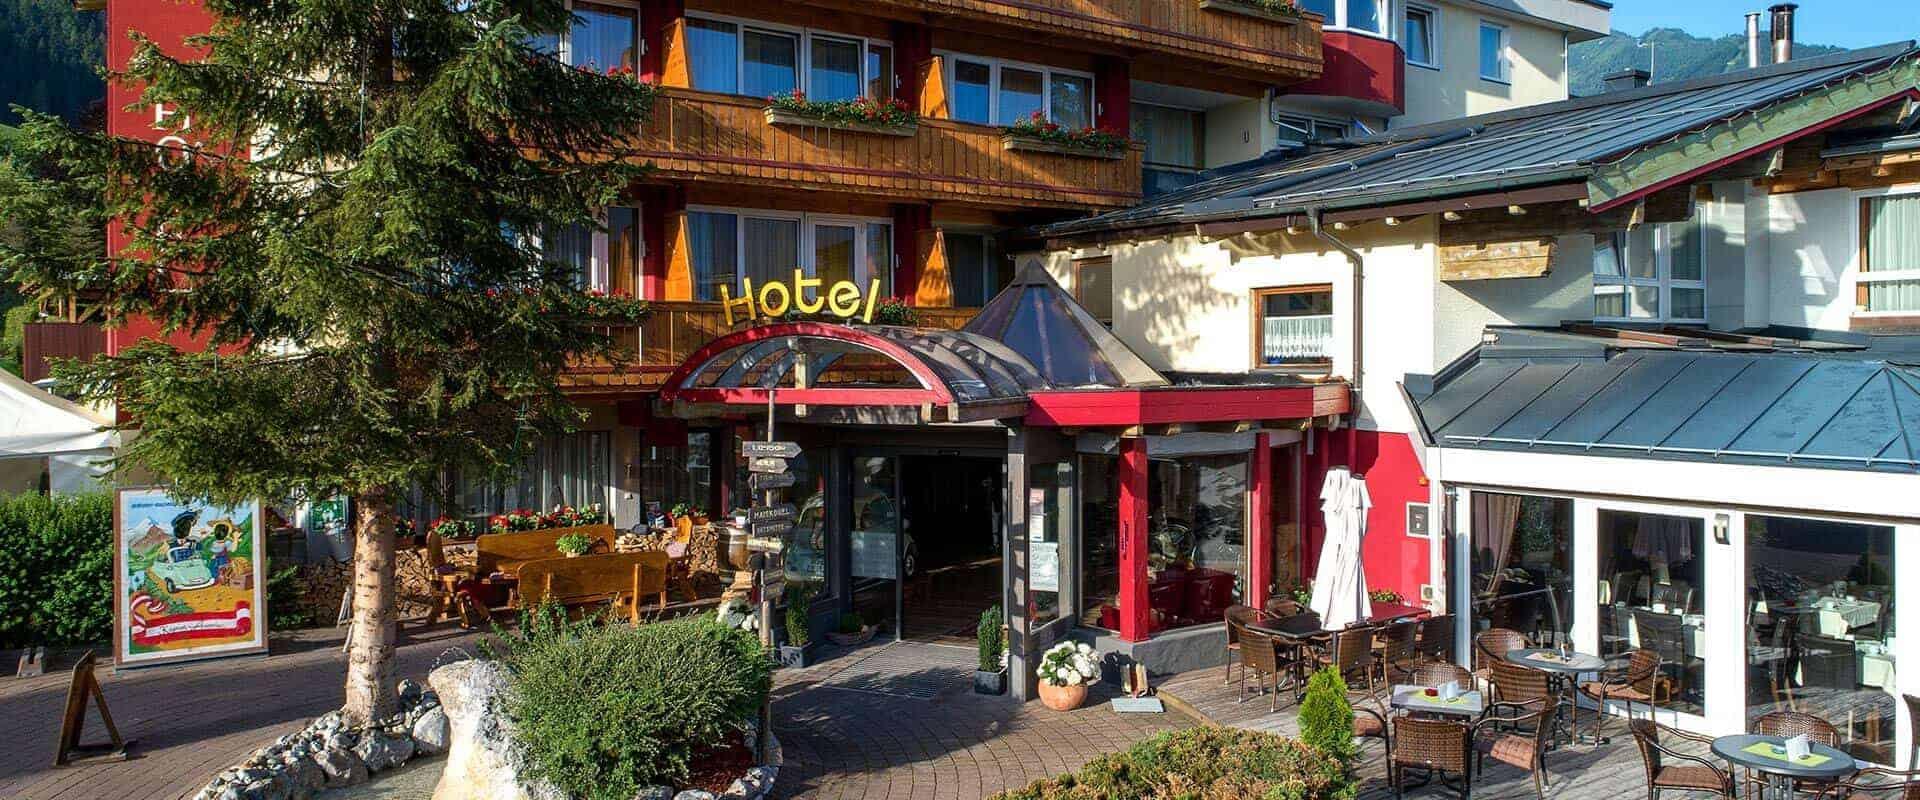 voetters hotel  sterne urlaub kaprun